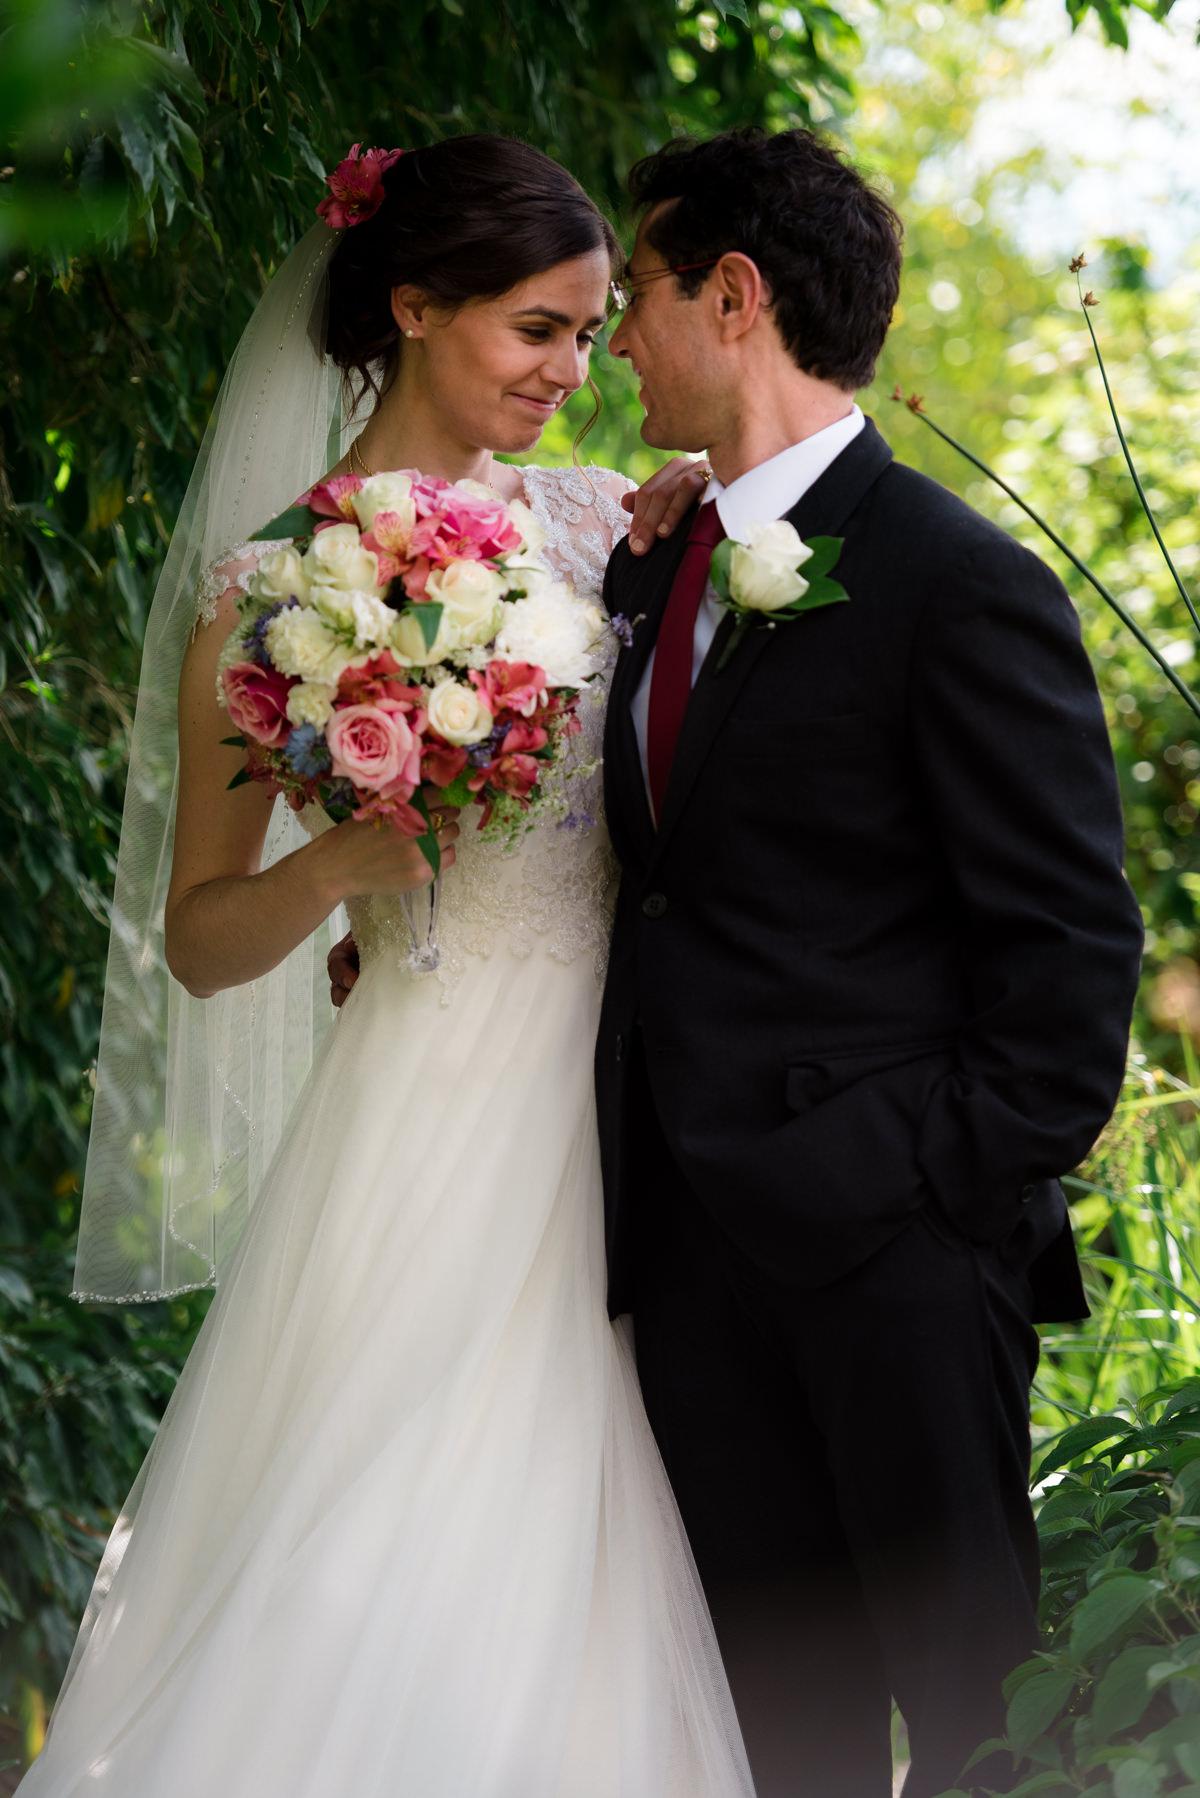 Andrew Tat - Documentary Wedding Photography - Kirkland, Washington - Emily & Cuauh - 23.JPG